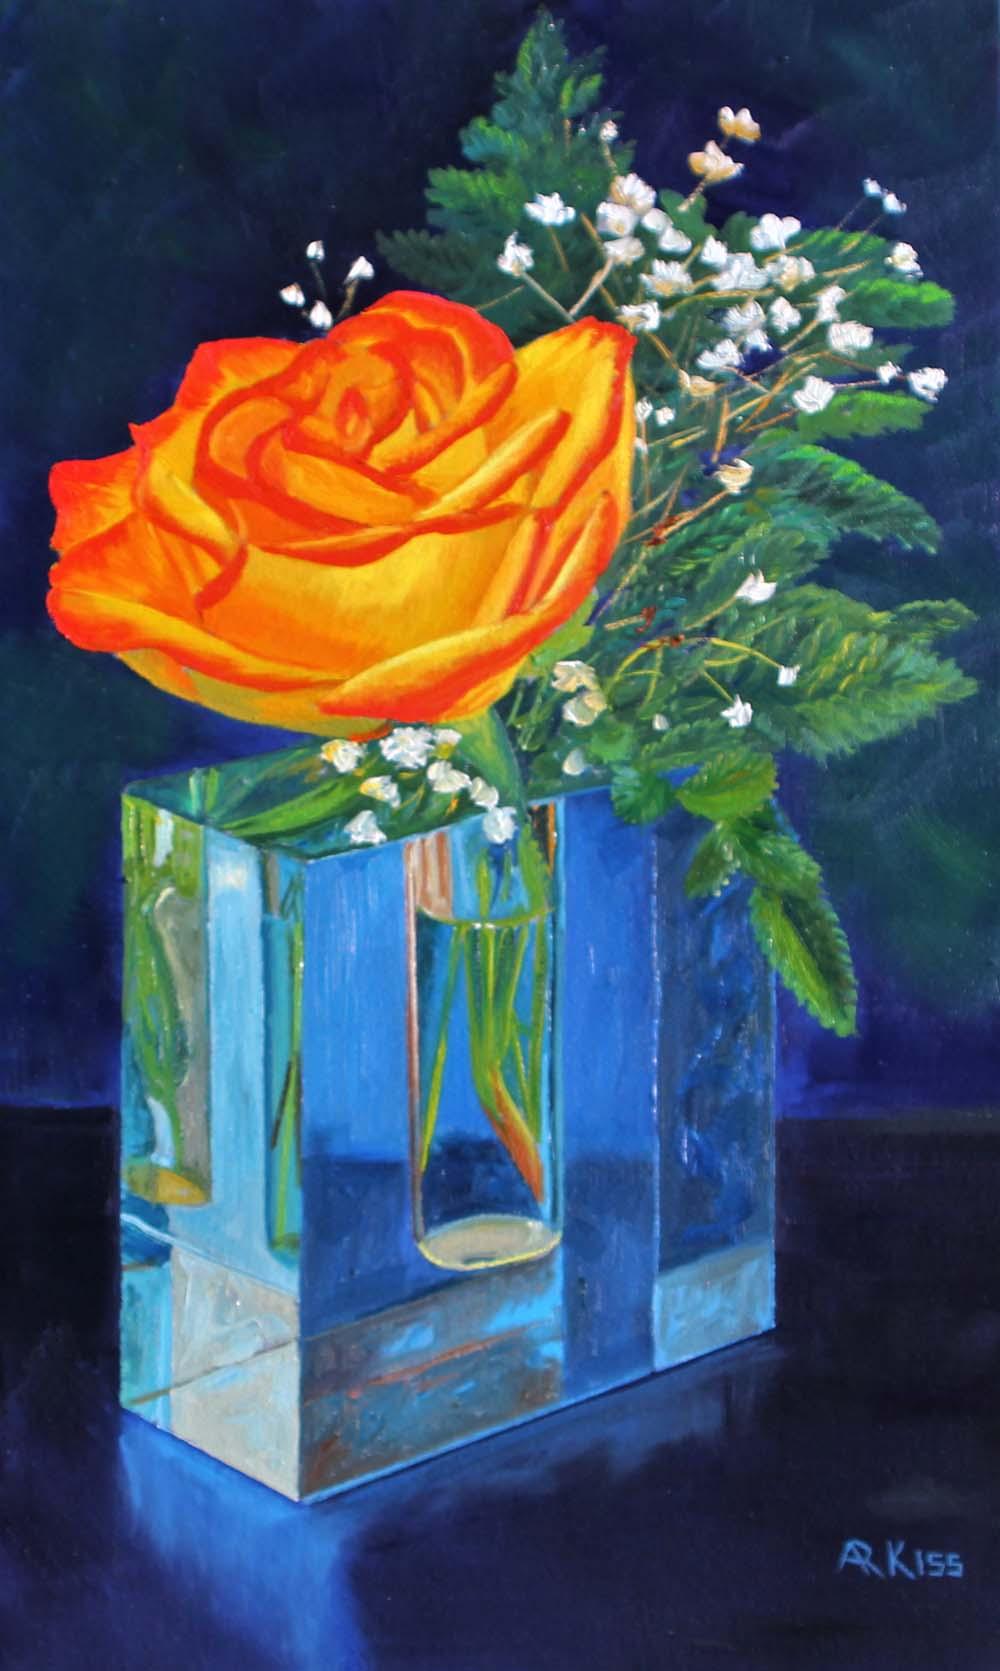 Rose - Andrew Kiss